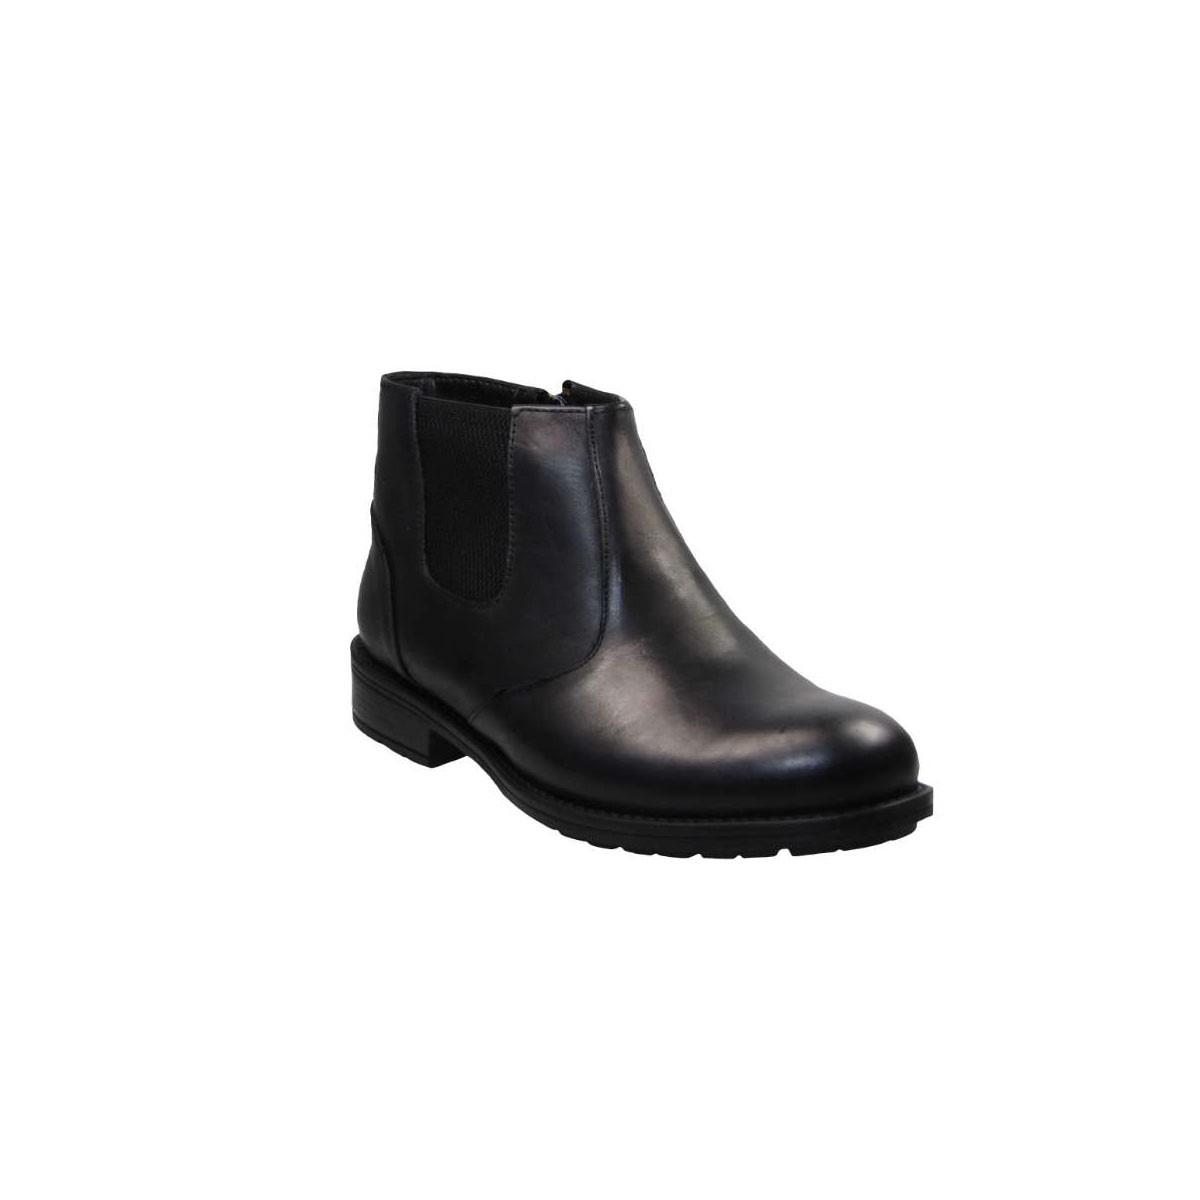 -29% Tsimpolis Tsimpolis Shoes 217 Μποτάκι Δερμάτινο Μαύρο 7a53f50eb52